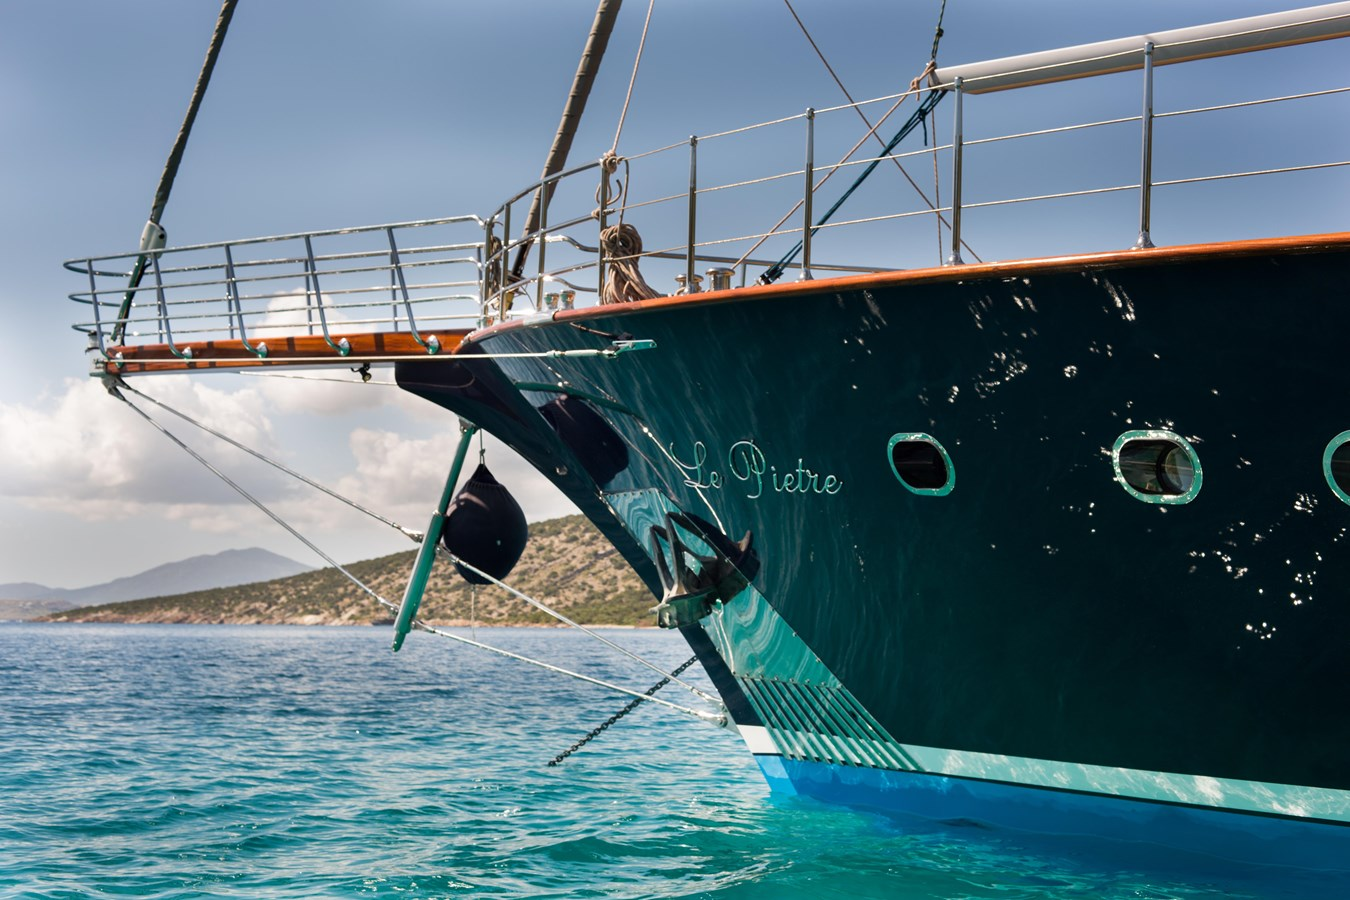 Le Pietre 5 2009 ADA YACHT WORKS  Cruising Ketch 2855462